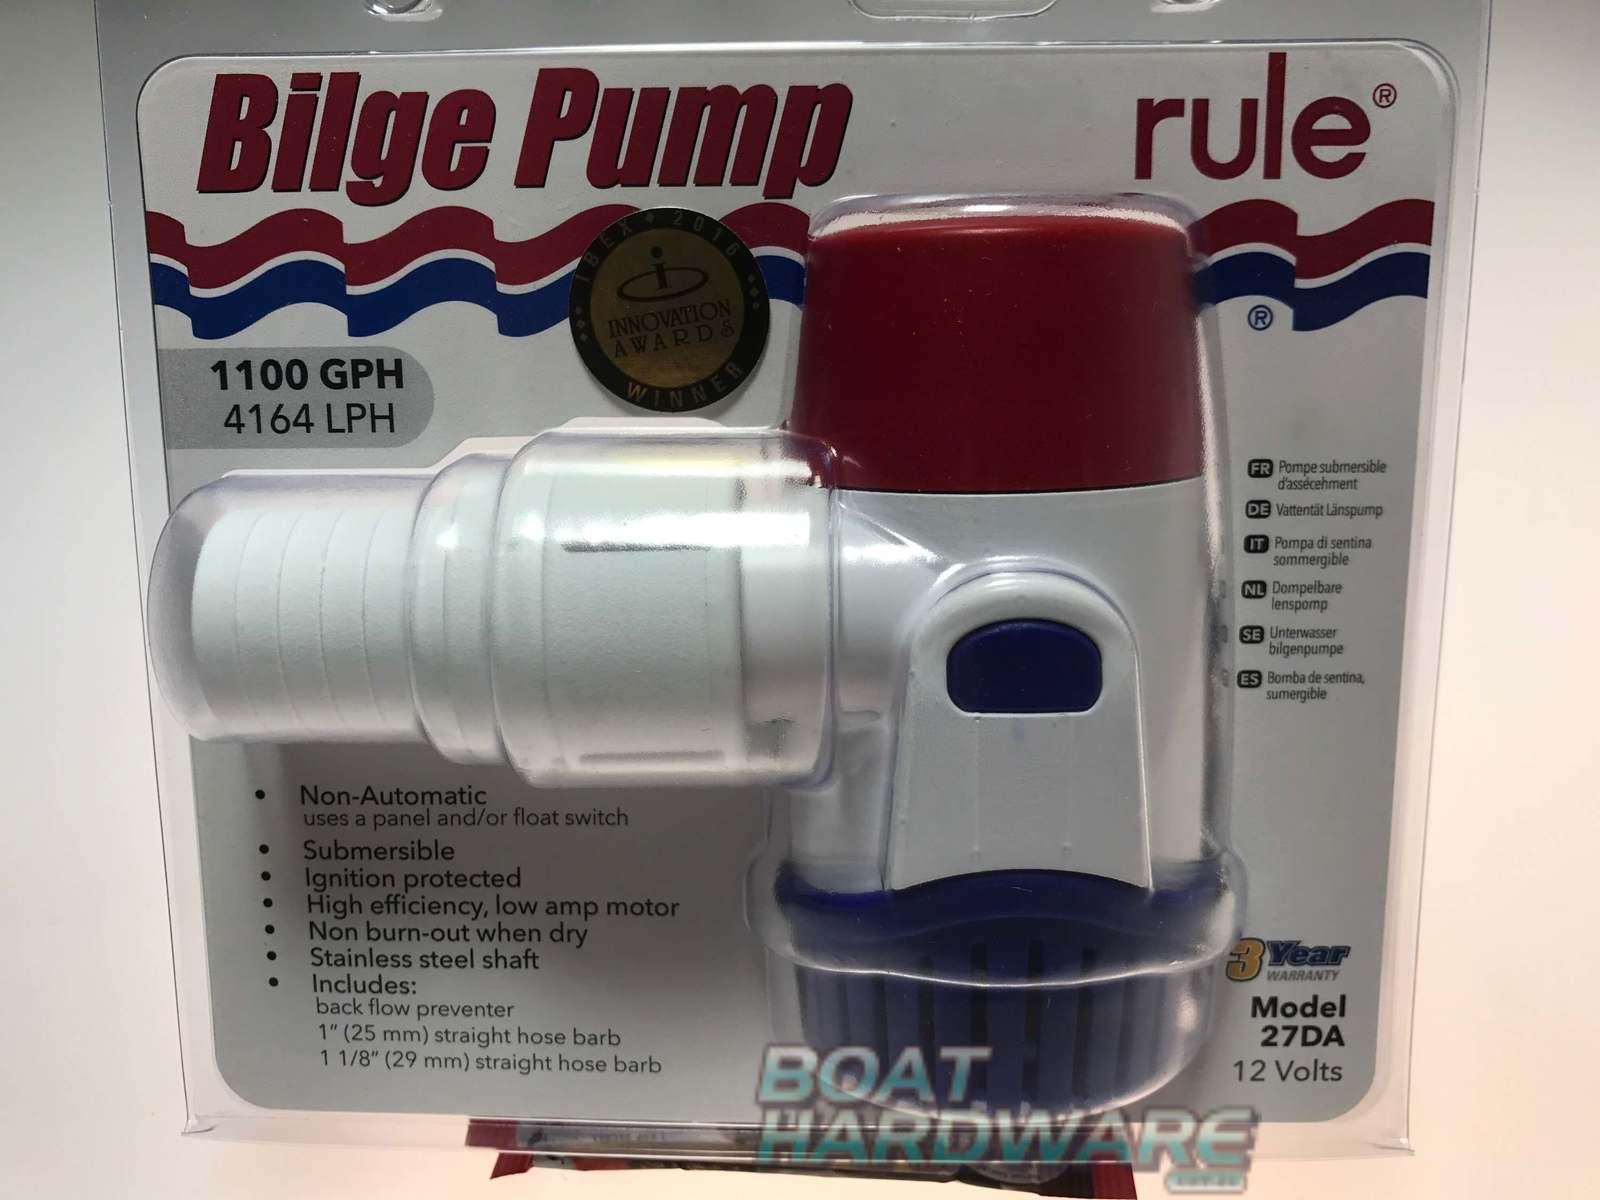 new model rule electric bilge pump 1100 gpm rule. Black Bedroom Furniture Sets. Home Design Ideas